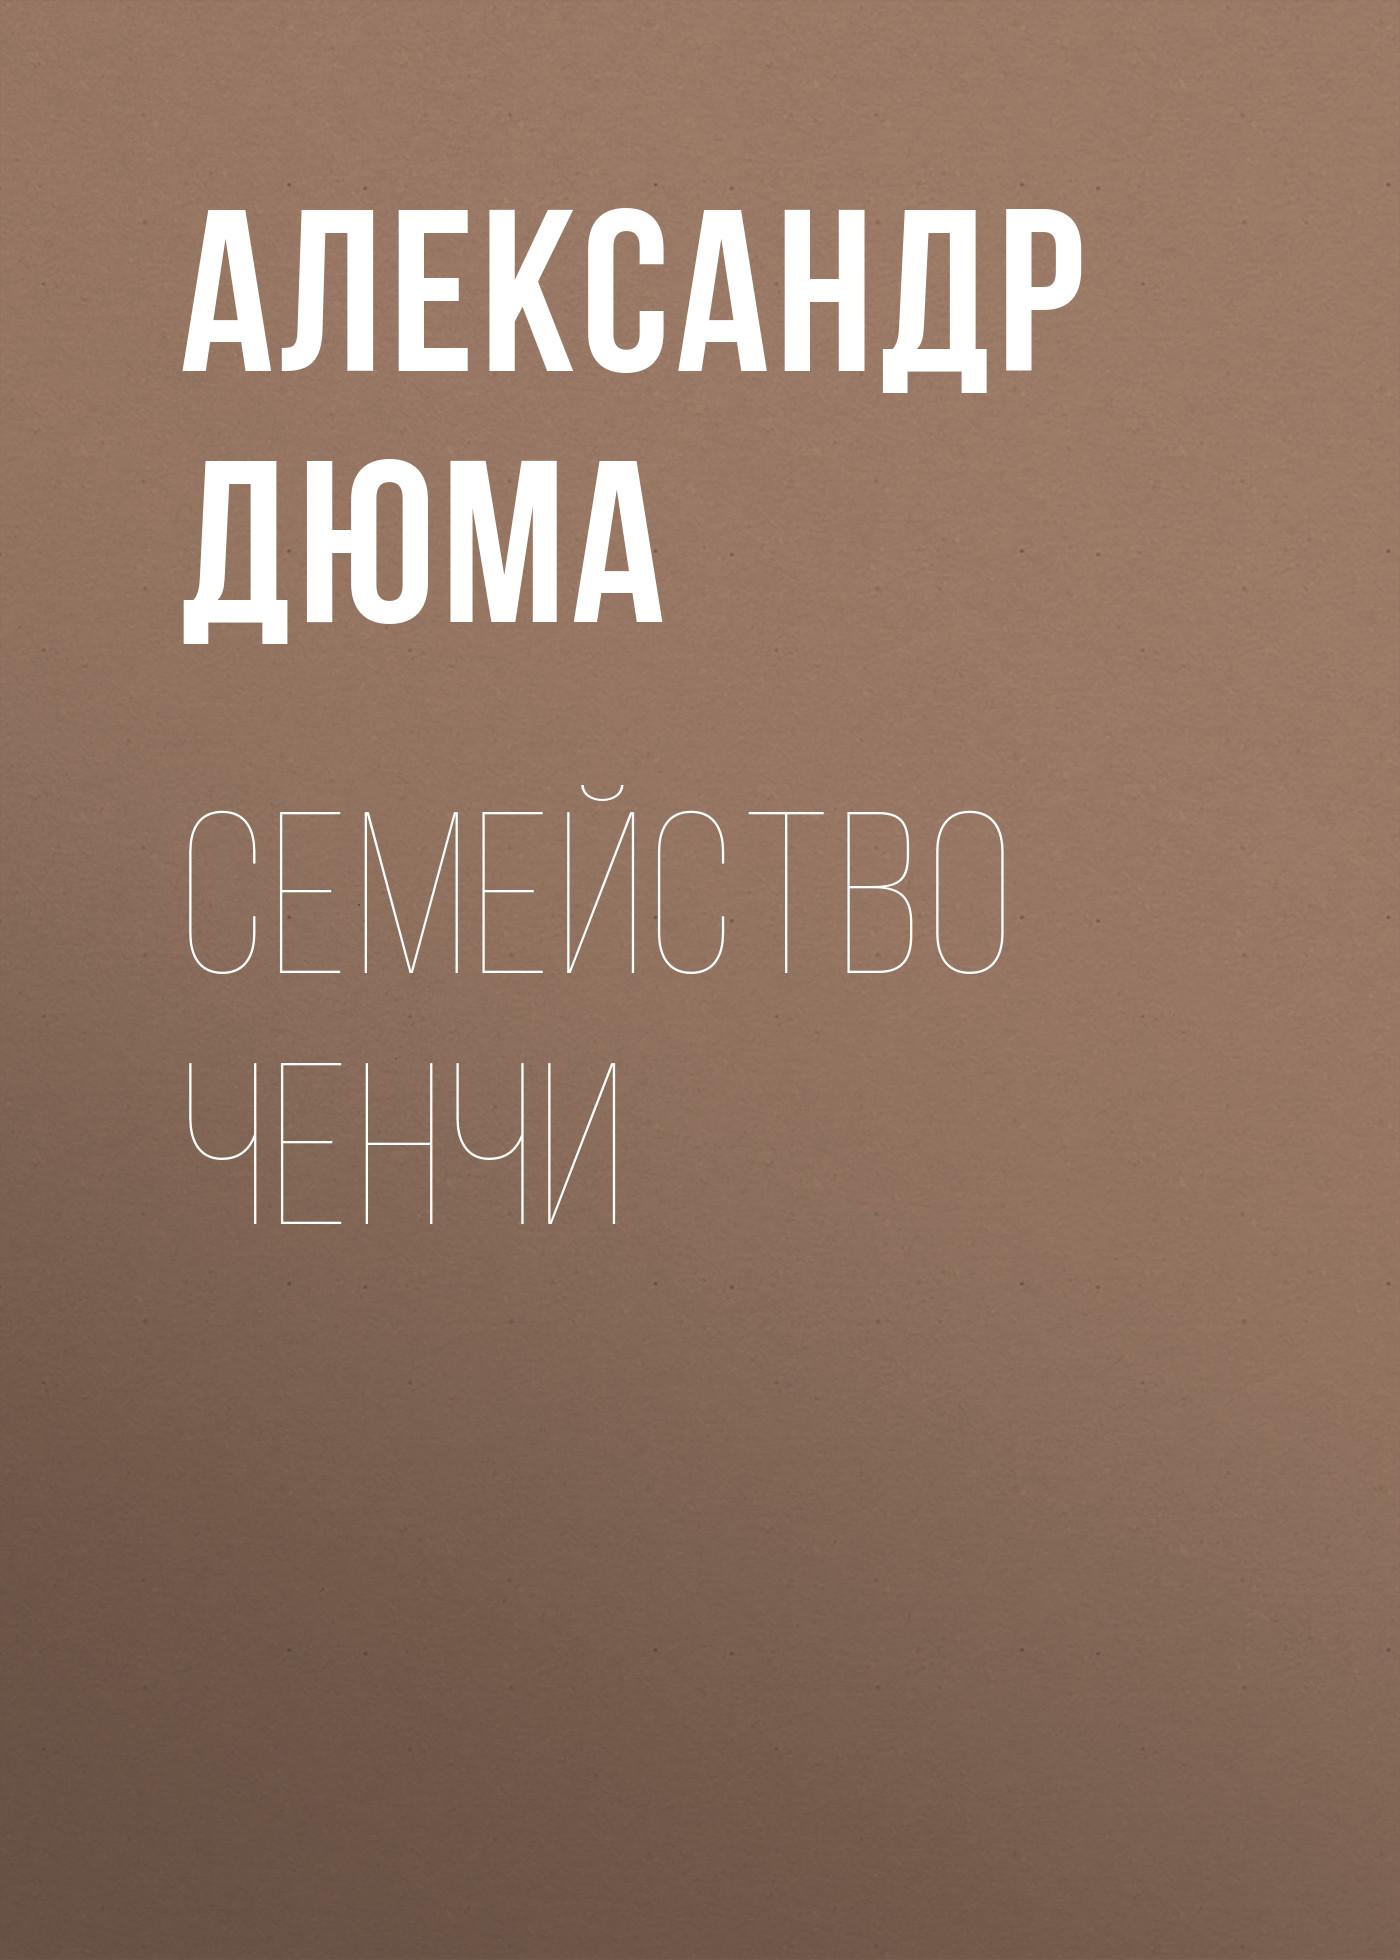 Купить книгу Семейство Ченчи, автора Александра Дюма